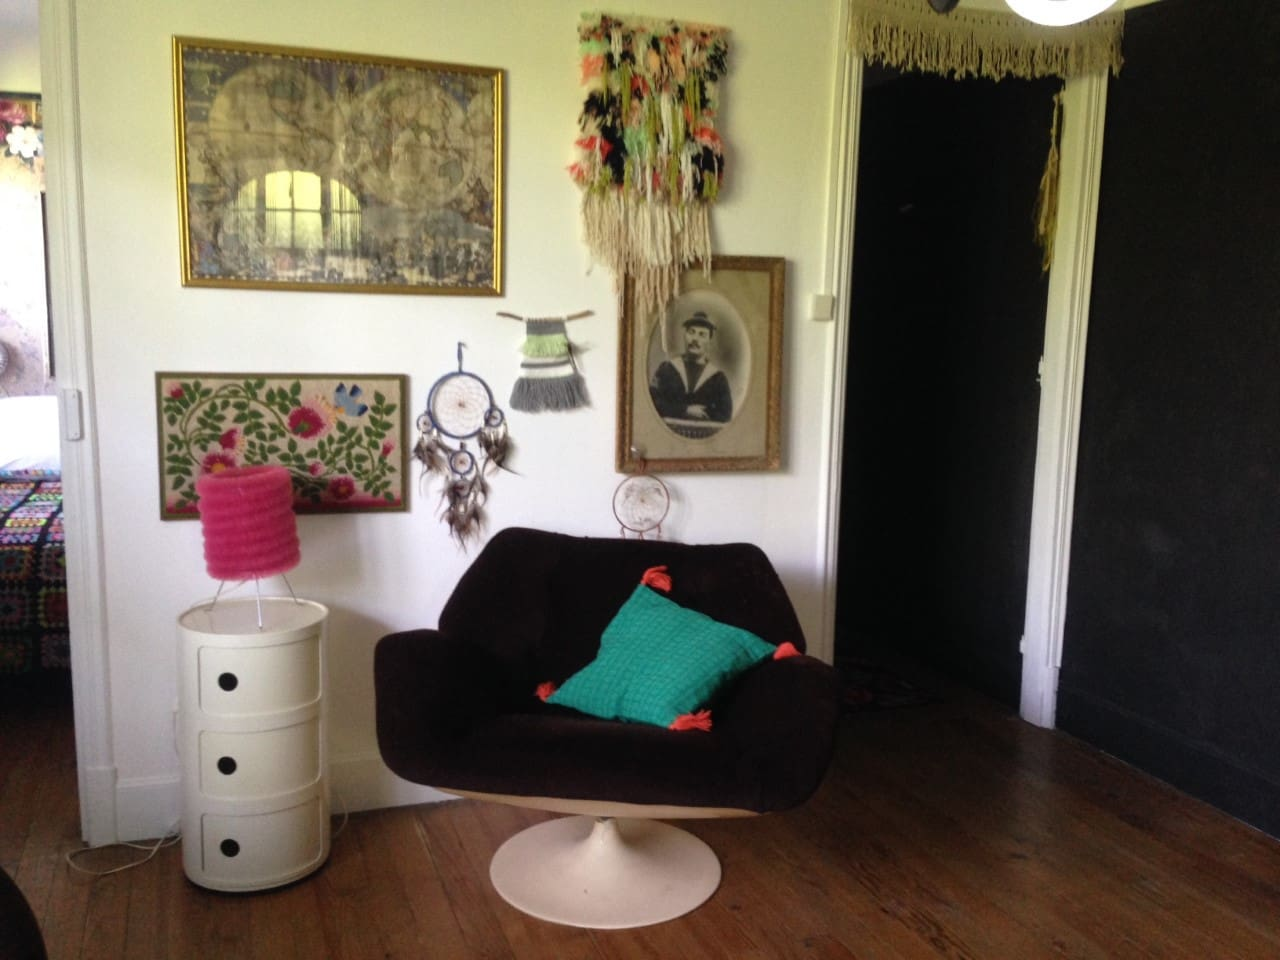 Salon 2 / Living Room 2